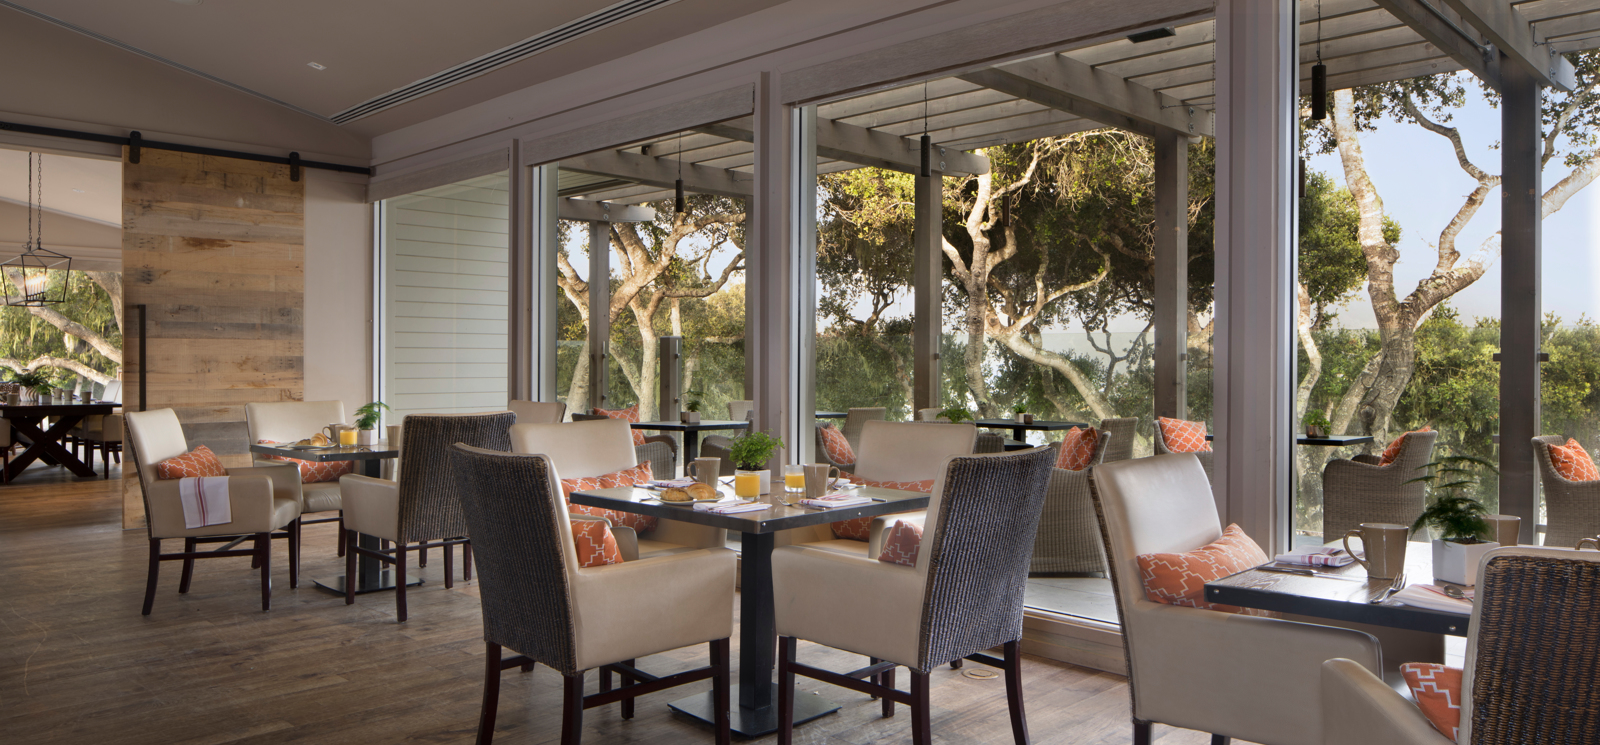 Carmel Valley Ranch_Dining_Valley Kitchen_restaurant_Valley View Room_Breakfast_12_PD